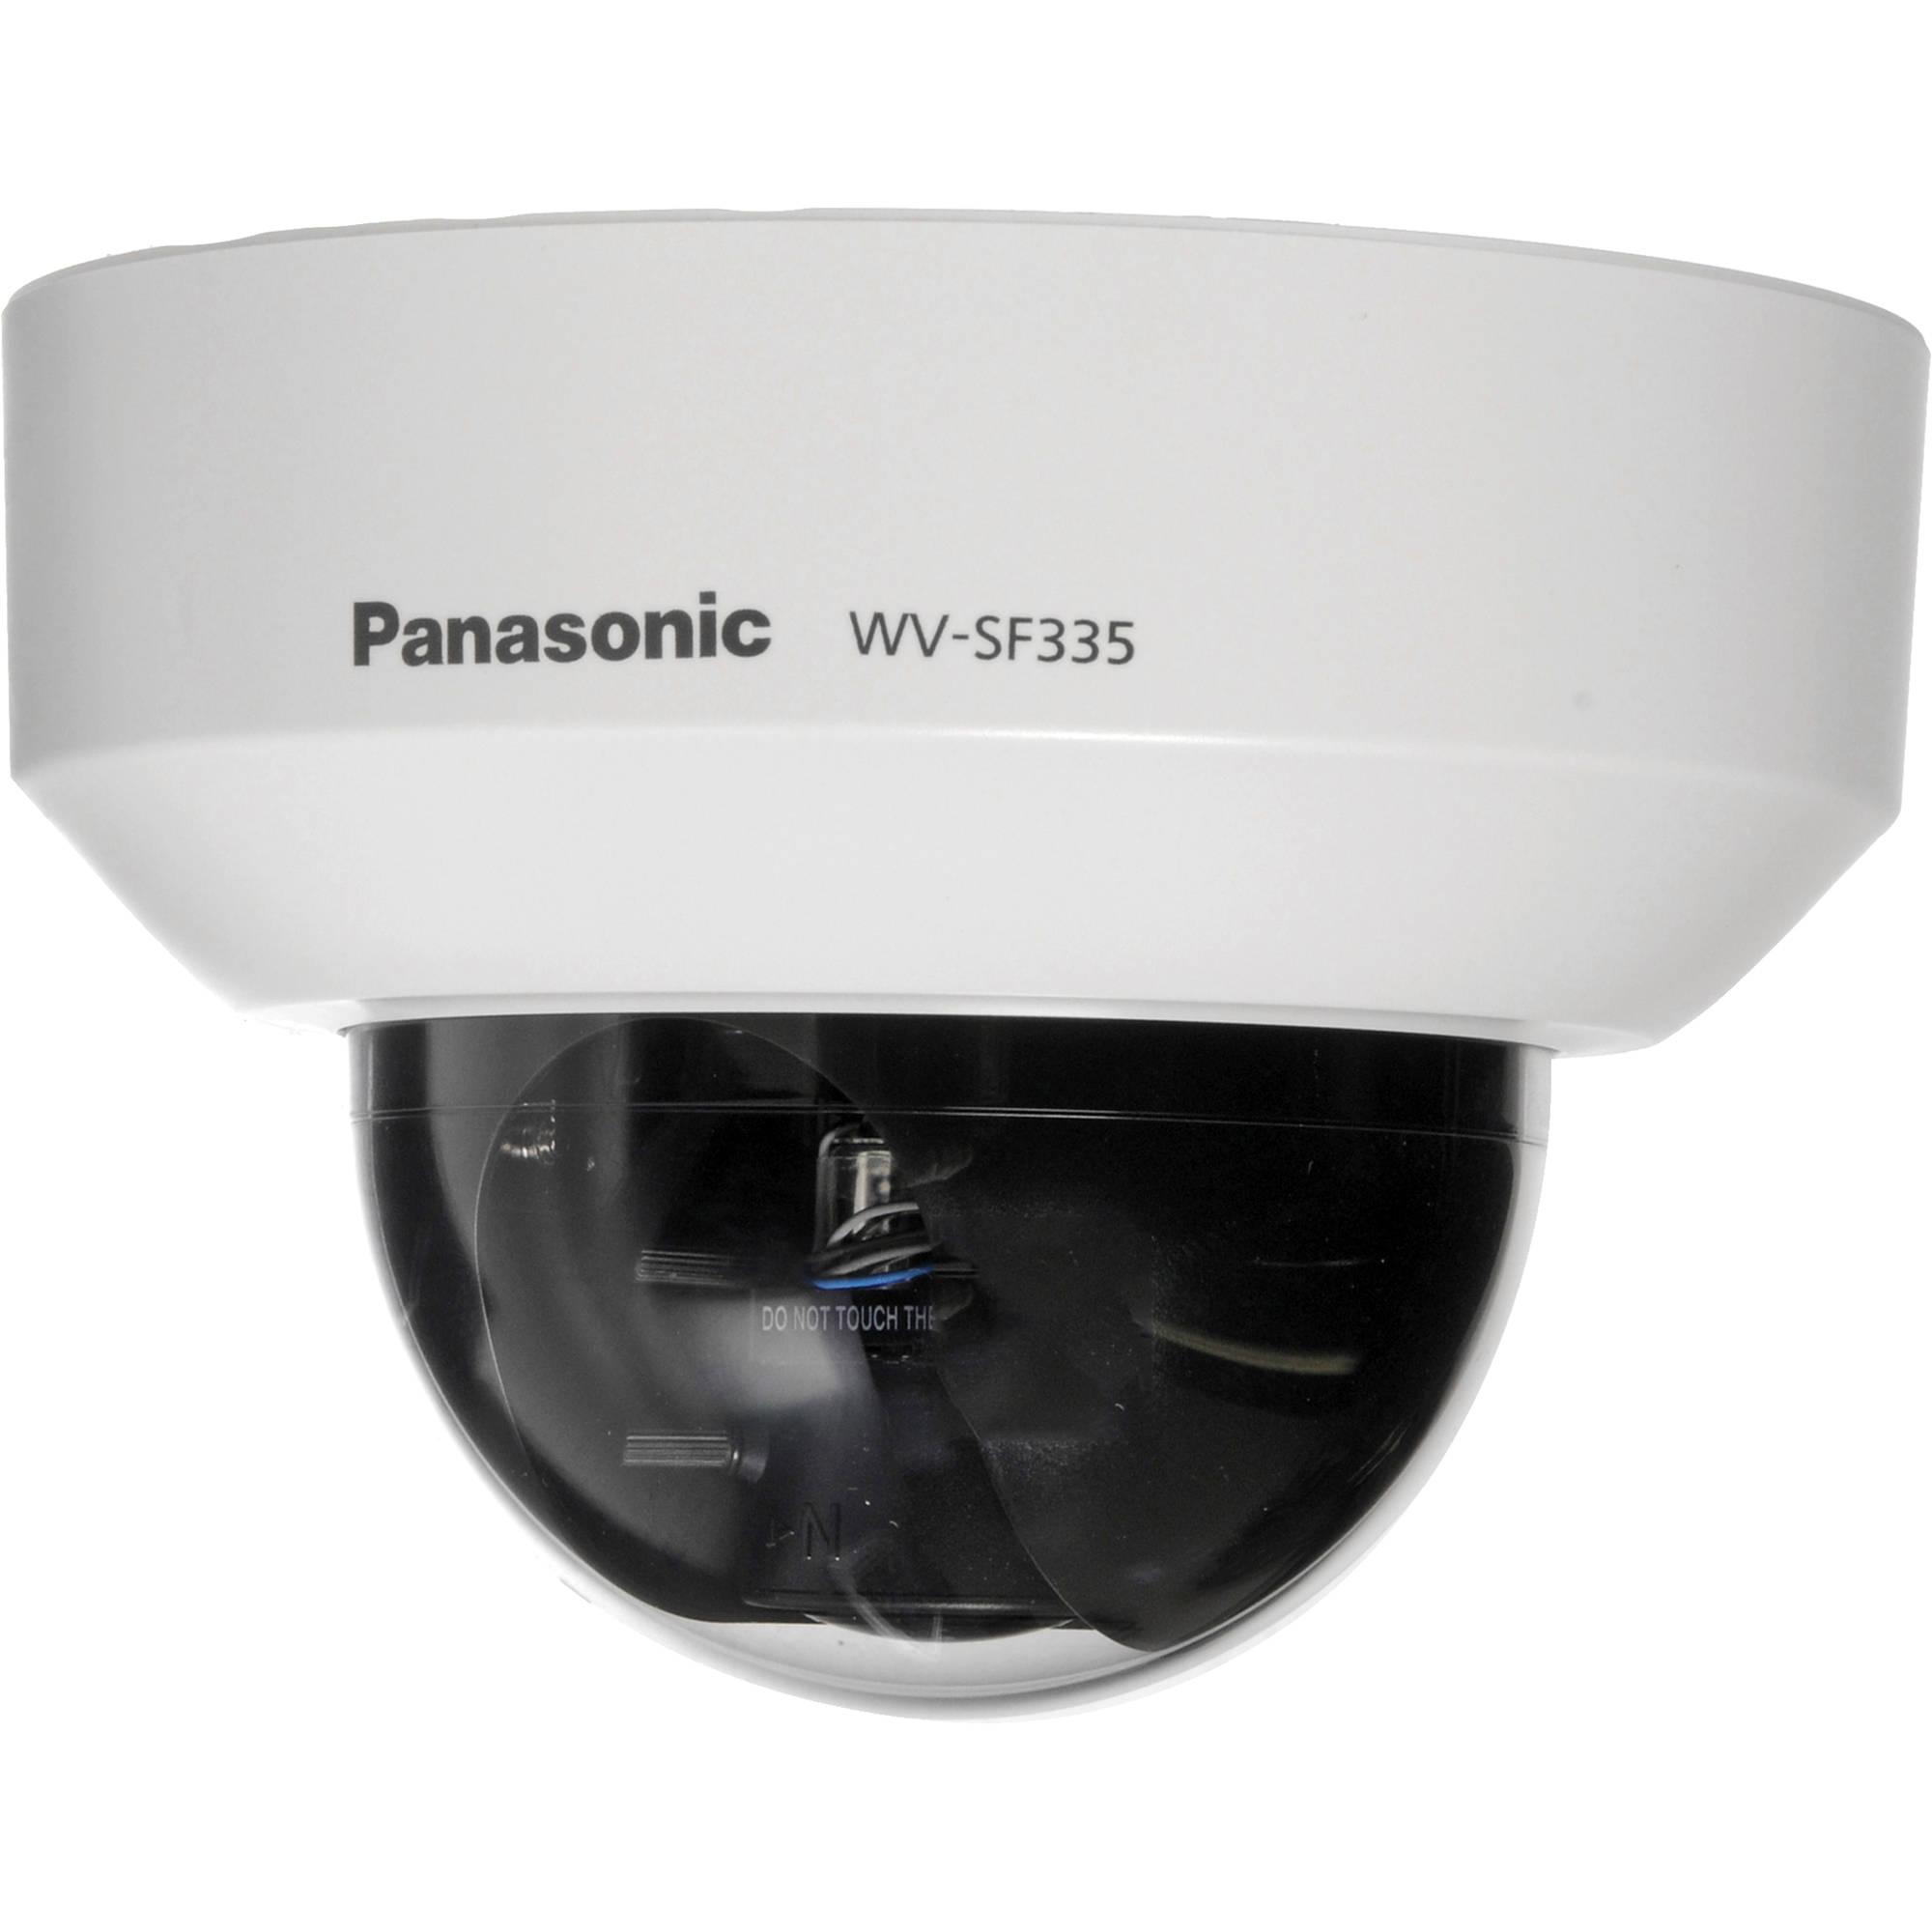 Panasonic Wv Sf335 H264 Fixed Dome Hd Network Camera Wv Sf335